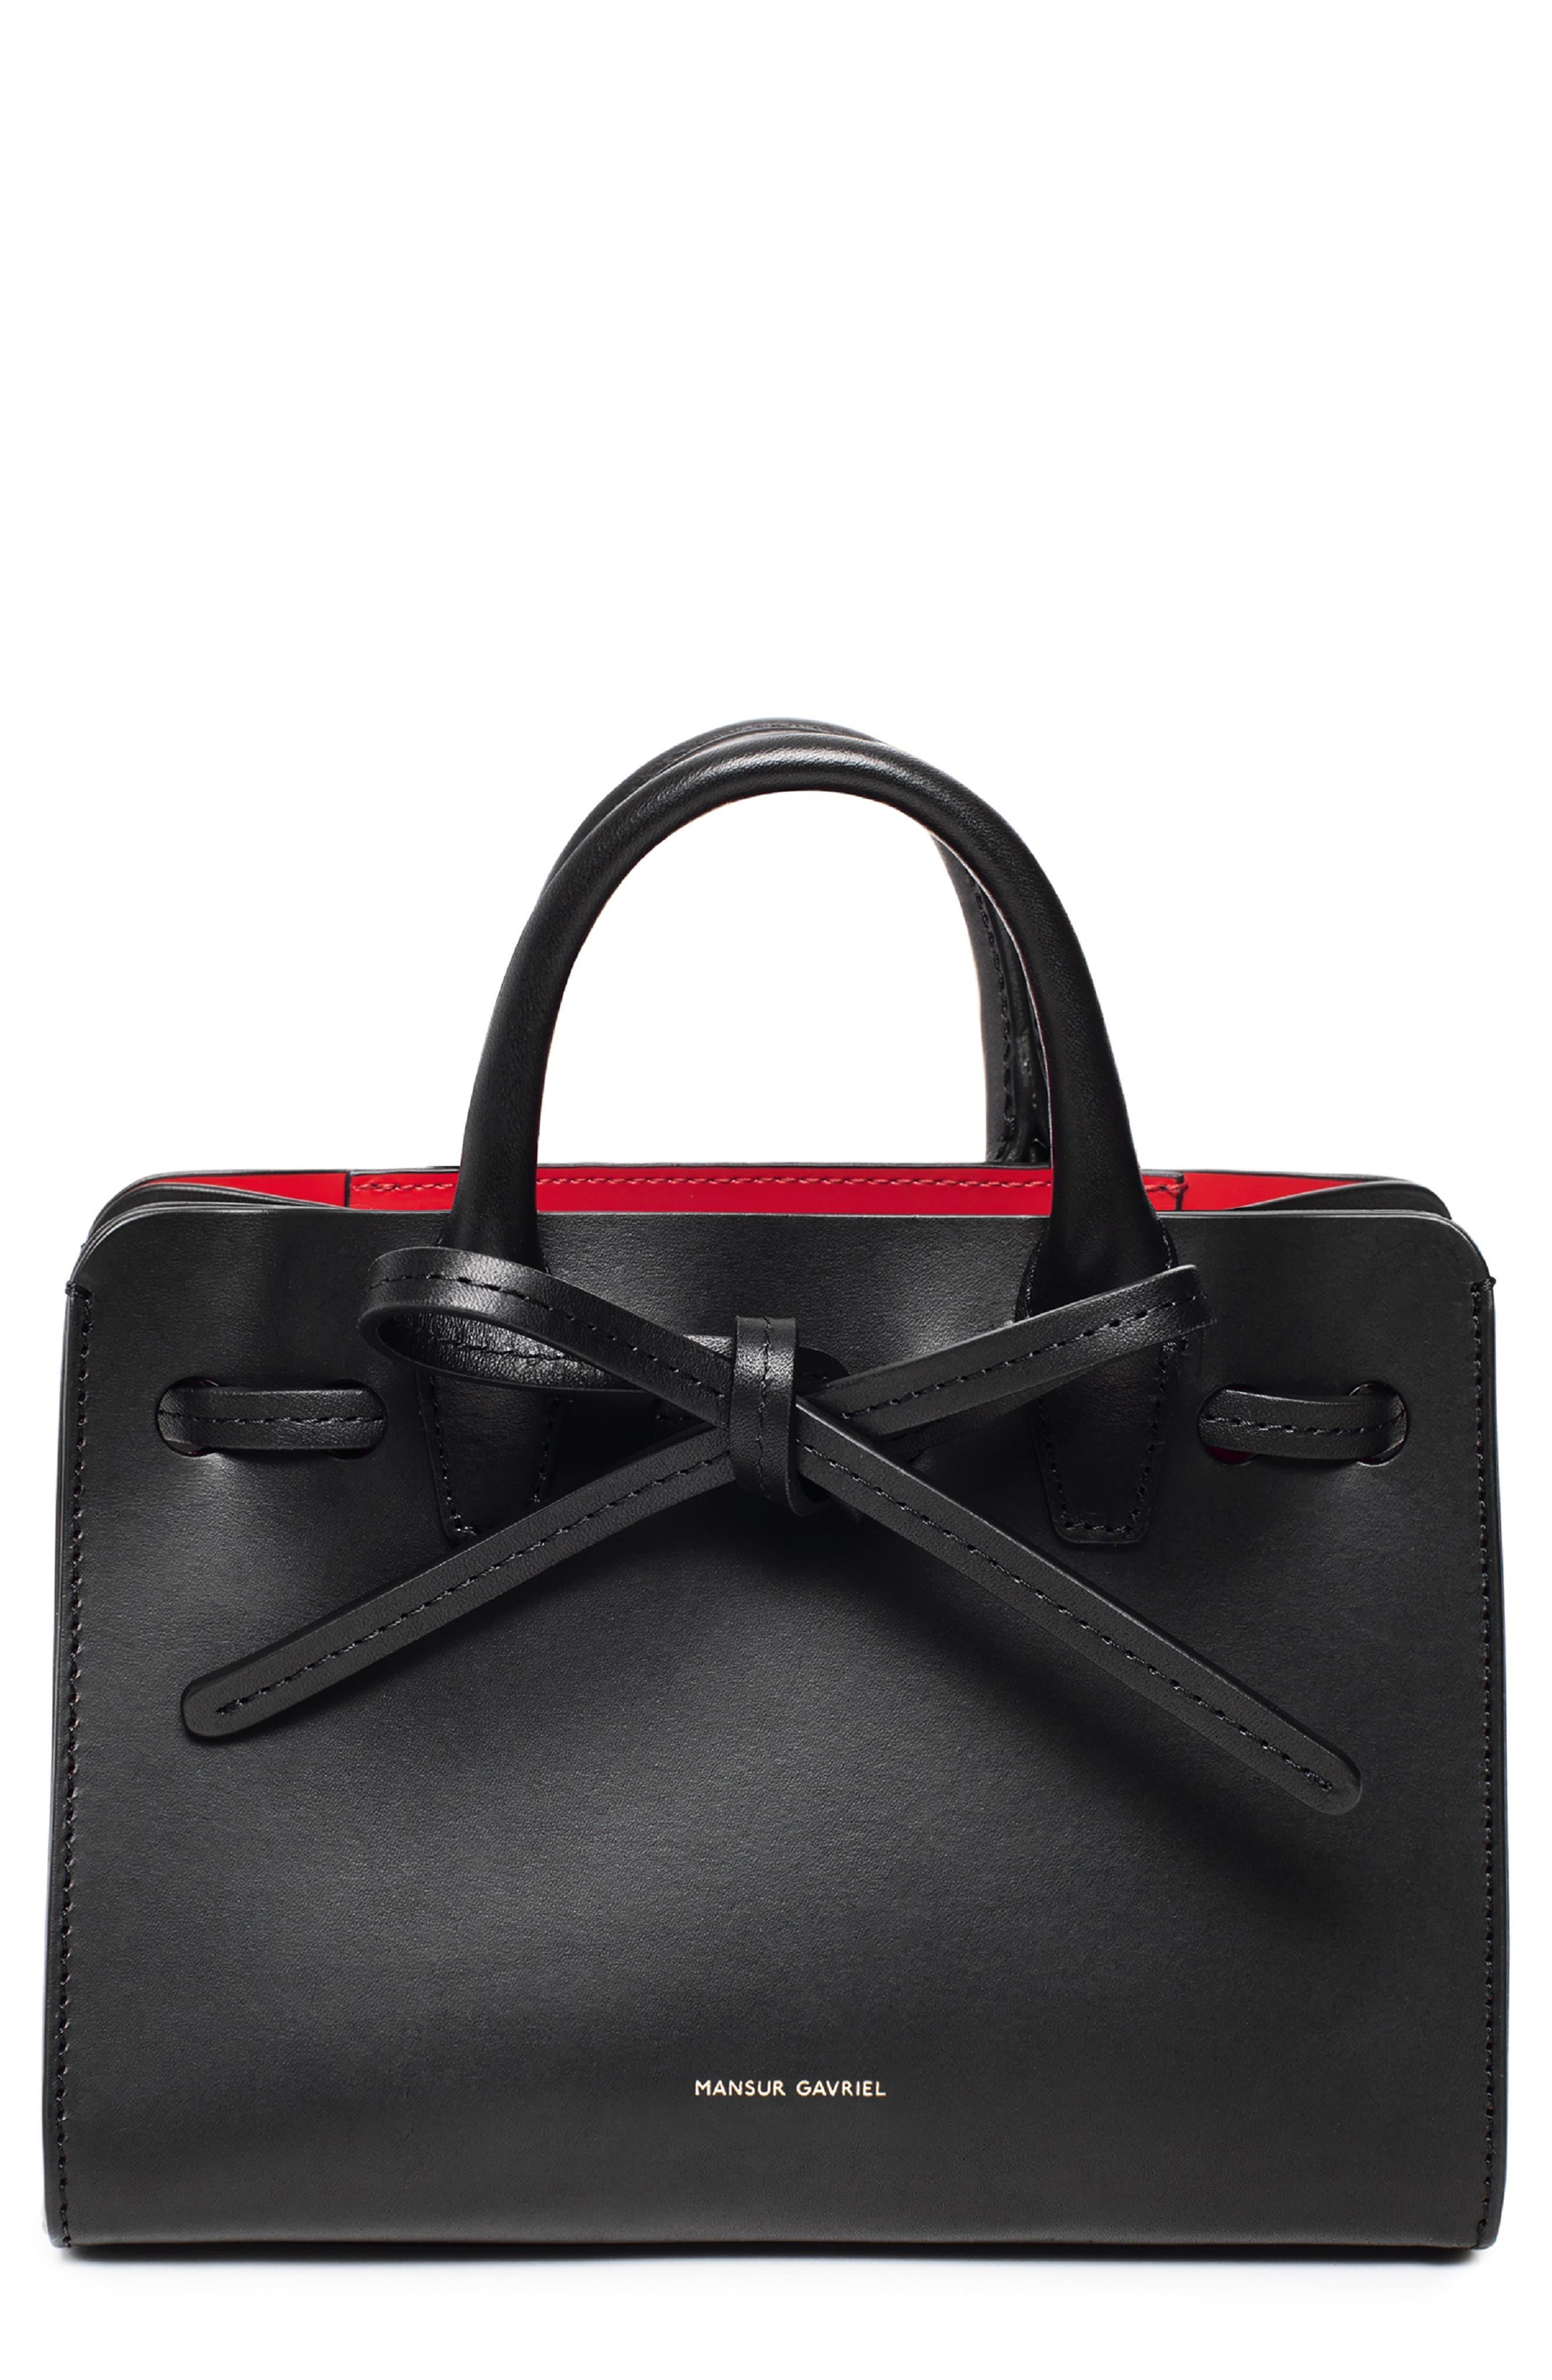 Mini Mini Sun Leather Bag - Black in Black/ Flamma